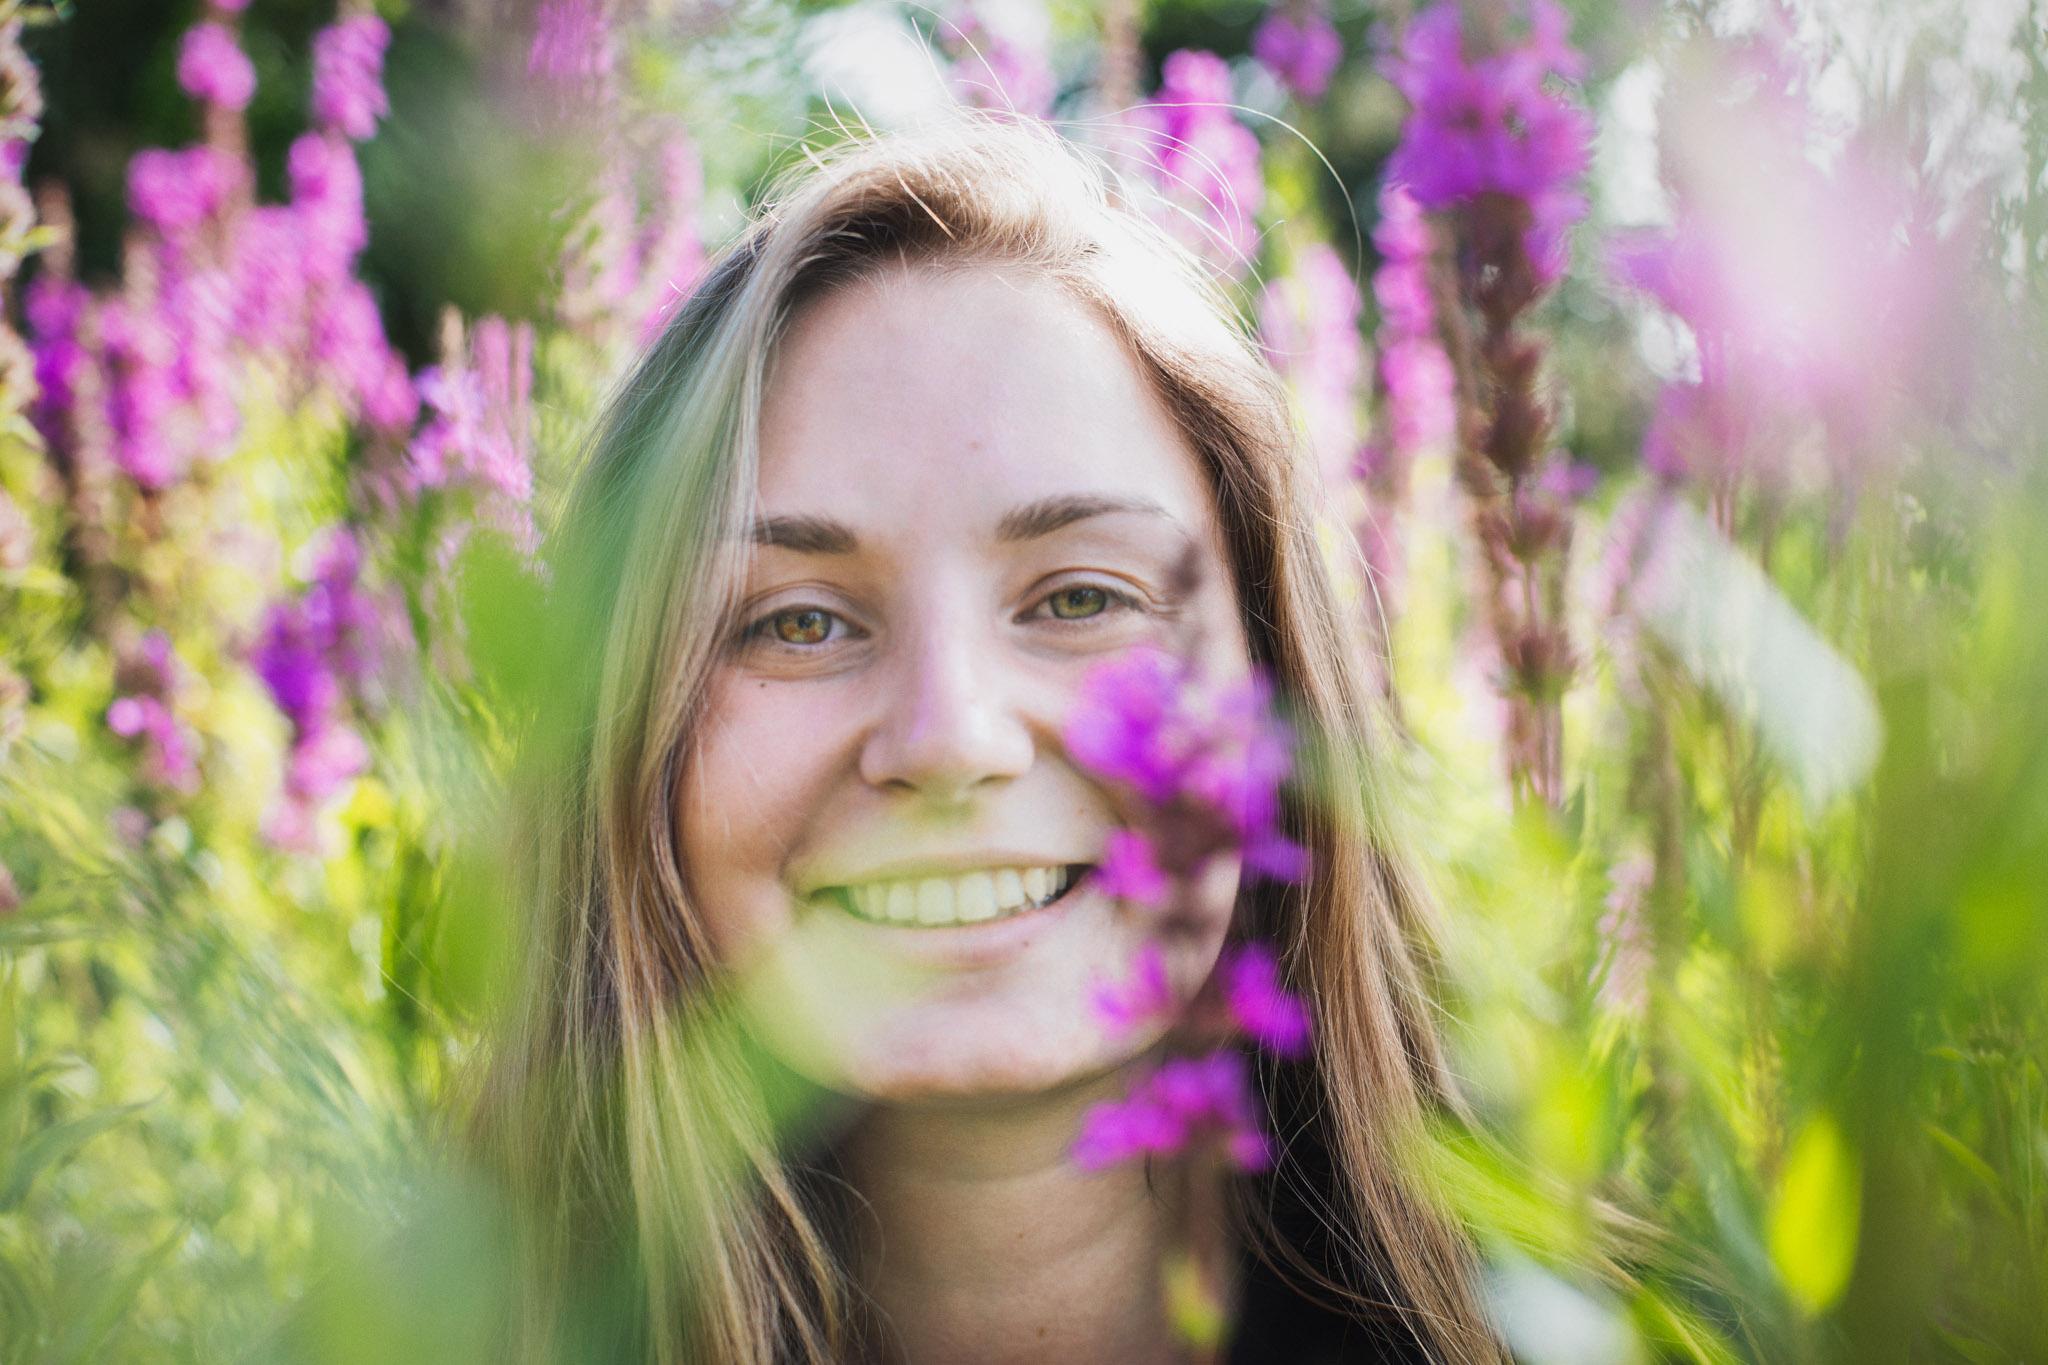 La PhotoTerreHapyy Portrait de Marley_SarahGalvanPhotographe